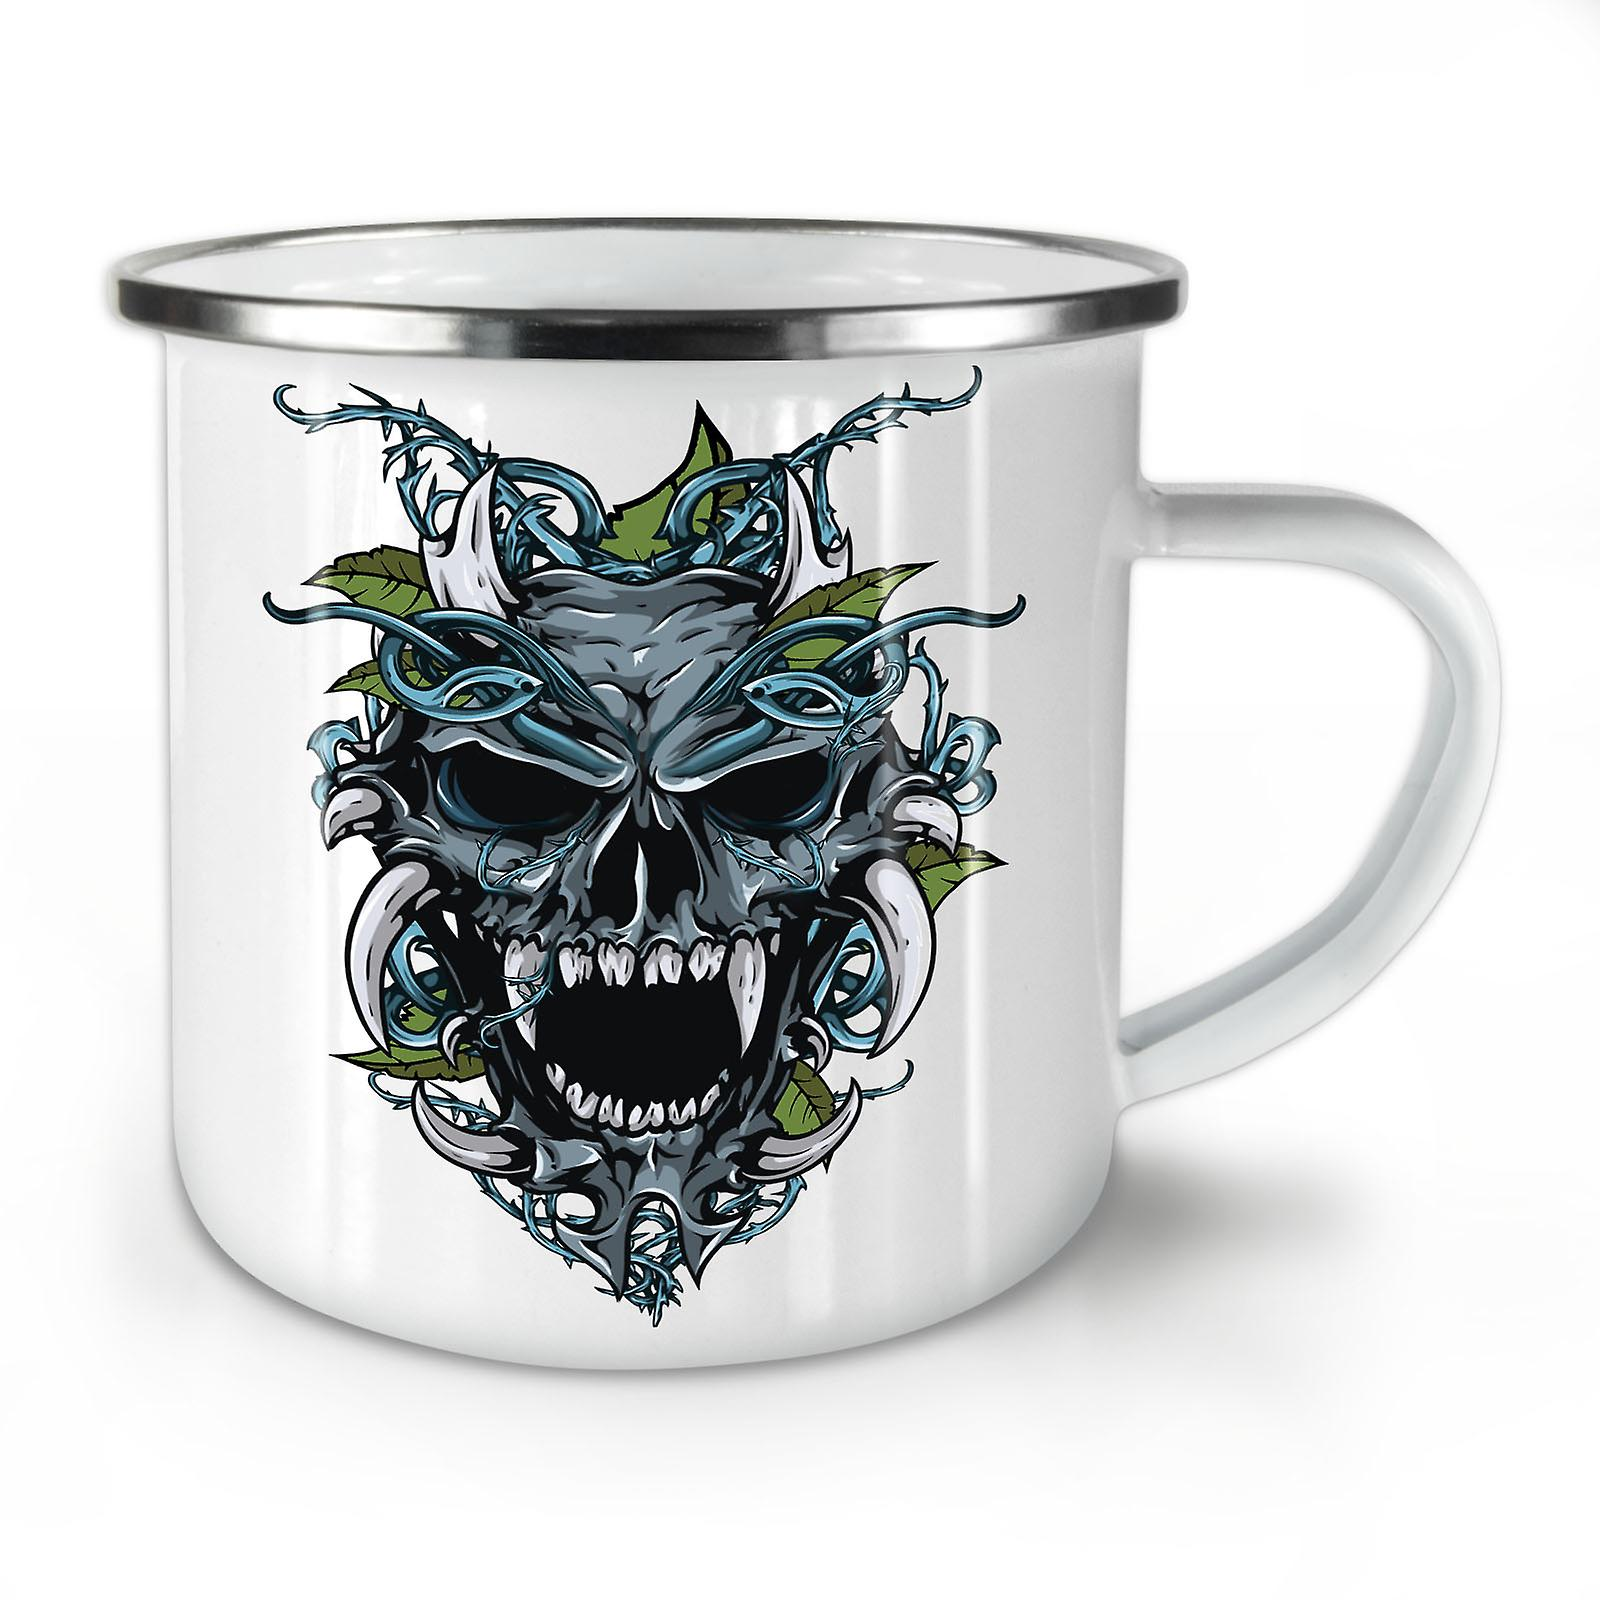 Demon Émail Mug10 L'enfer Café Whitetea OzWellcoda Nouveau HW9DIYe2E